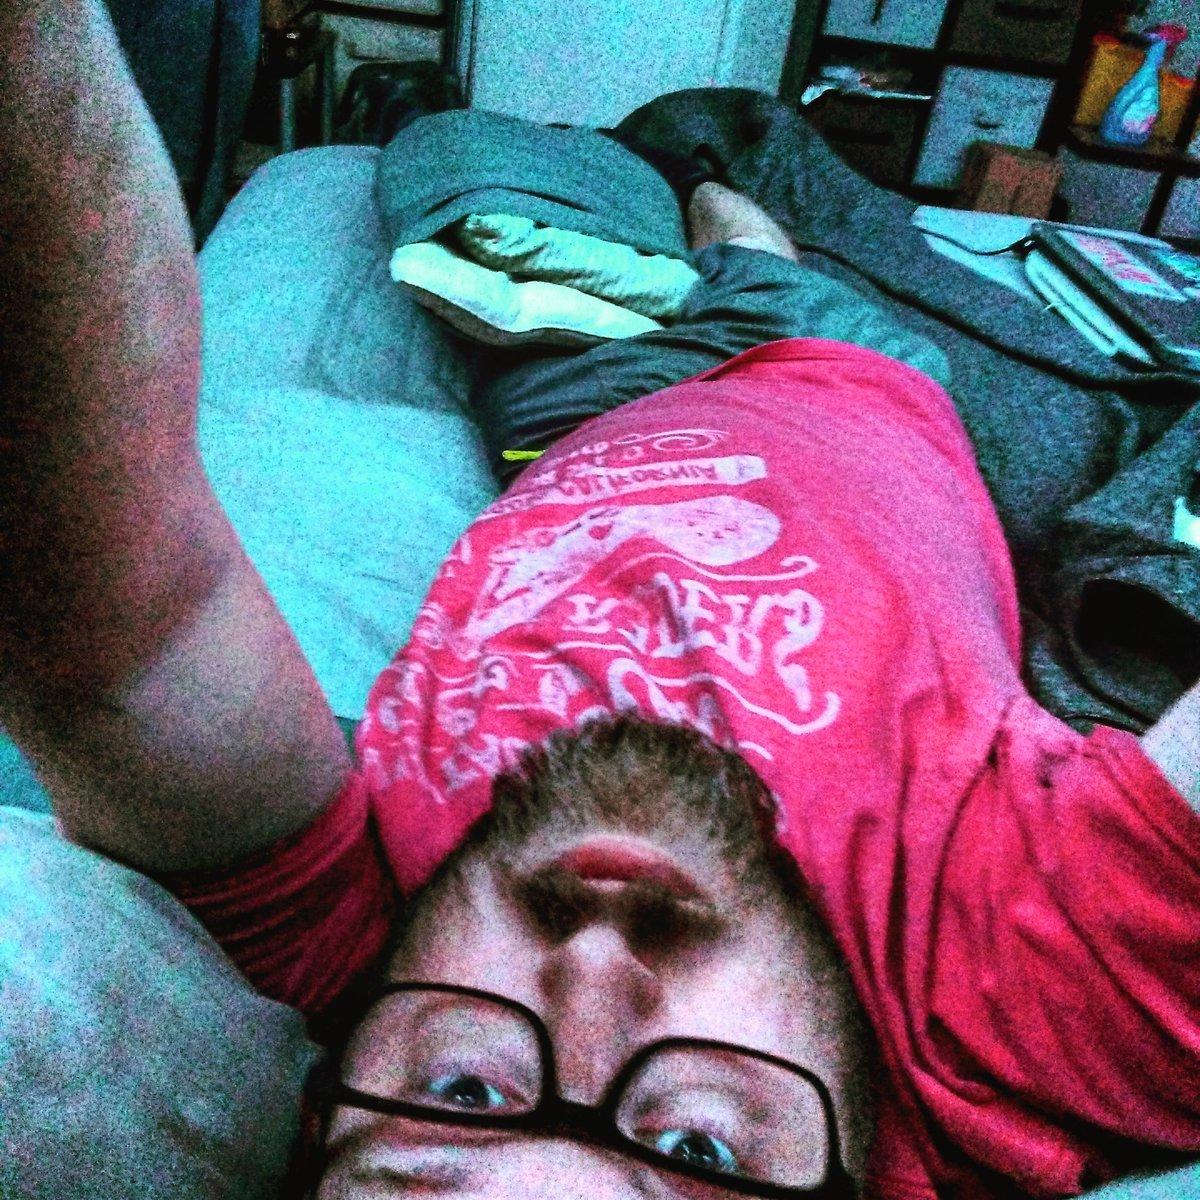 Sleepy time acrobatics.  #goodnight#selfiesunday pic.twitter.com/EpP6gLOEde